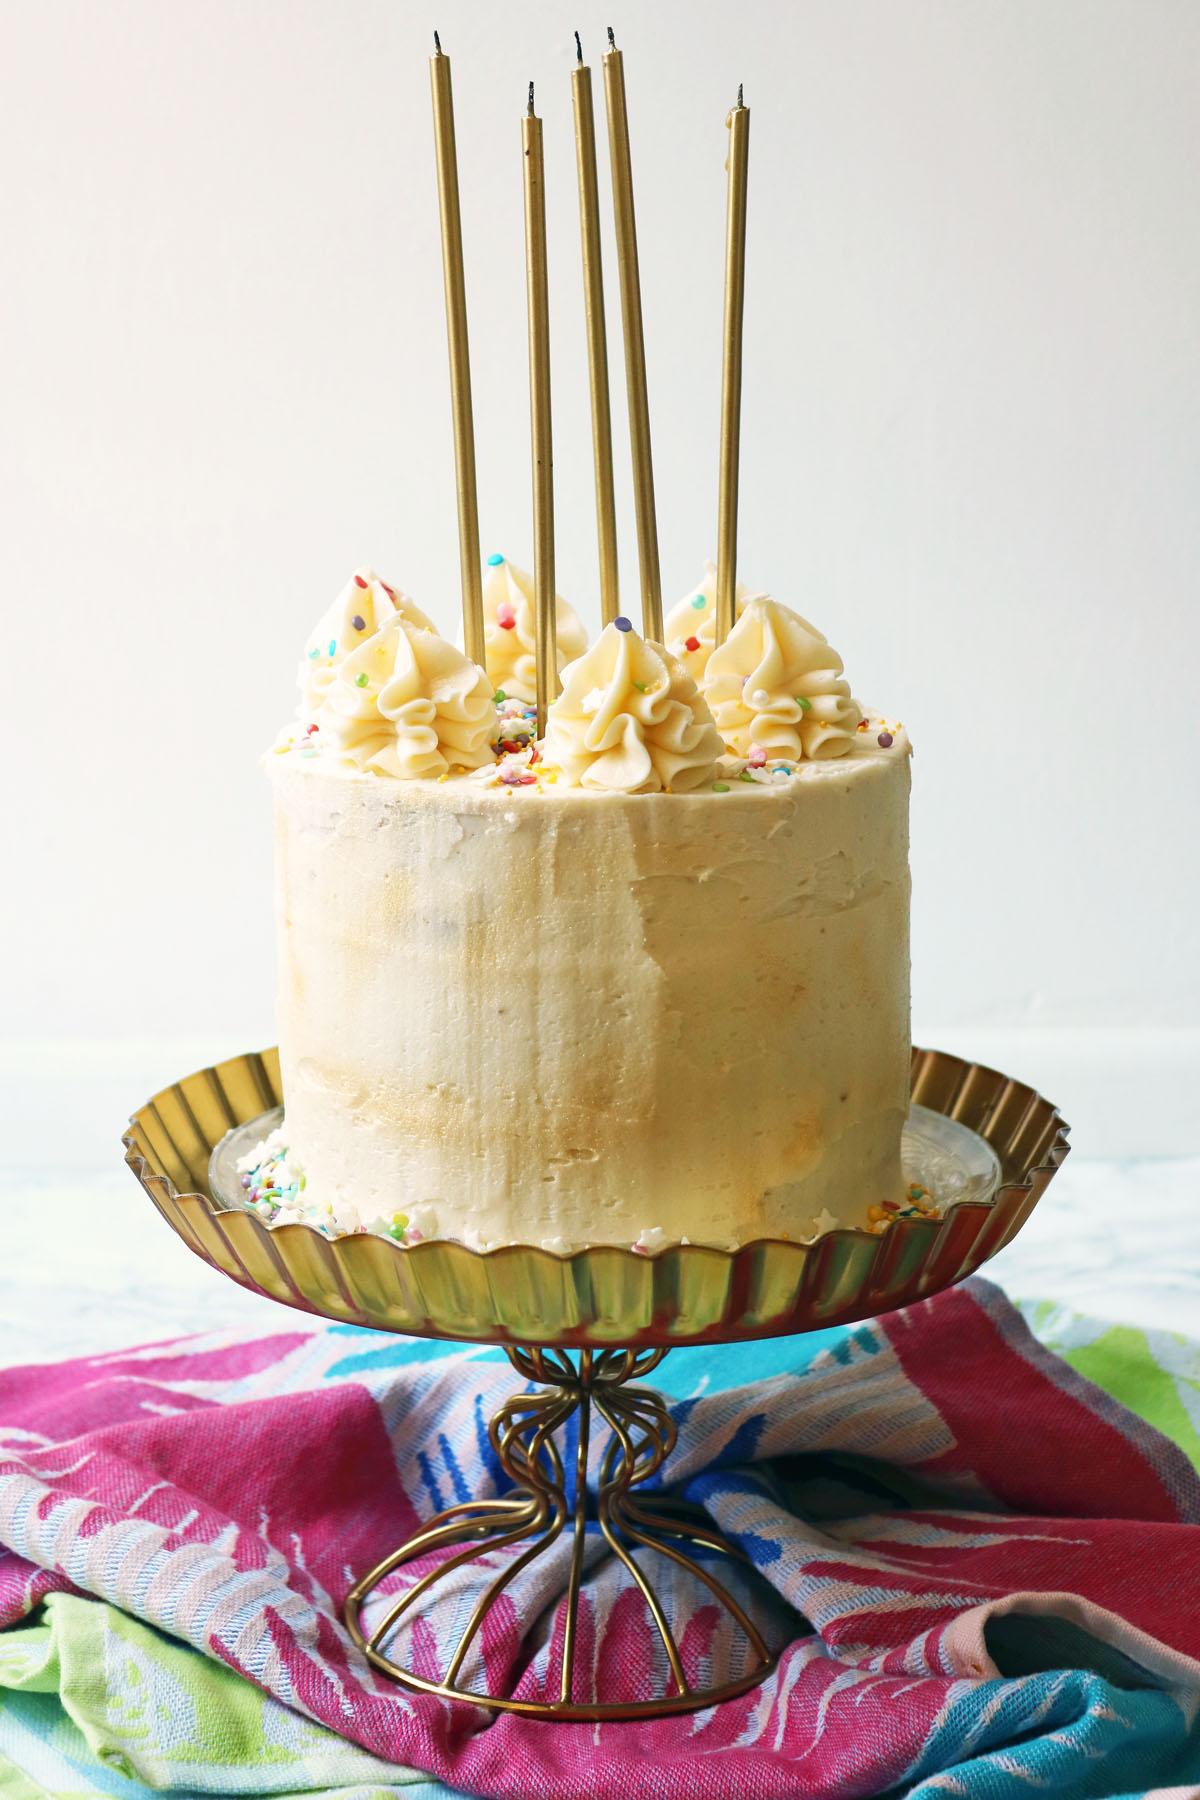 Candles on my vegan birthday cake